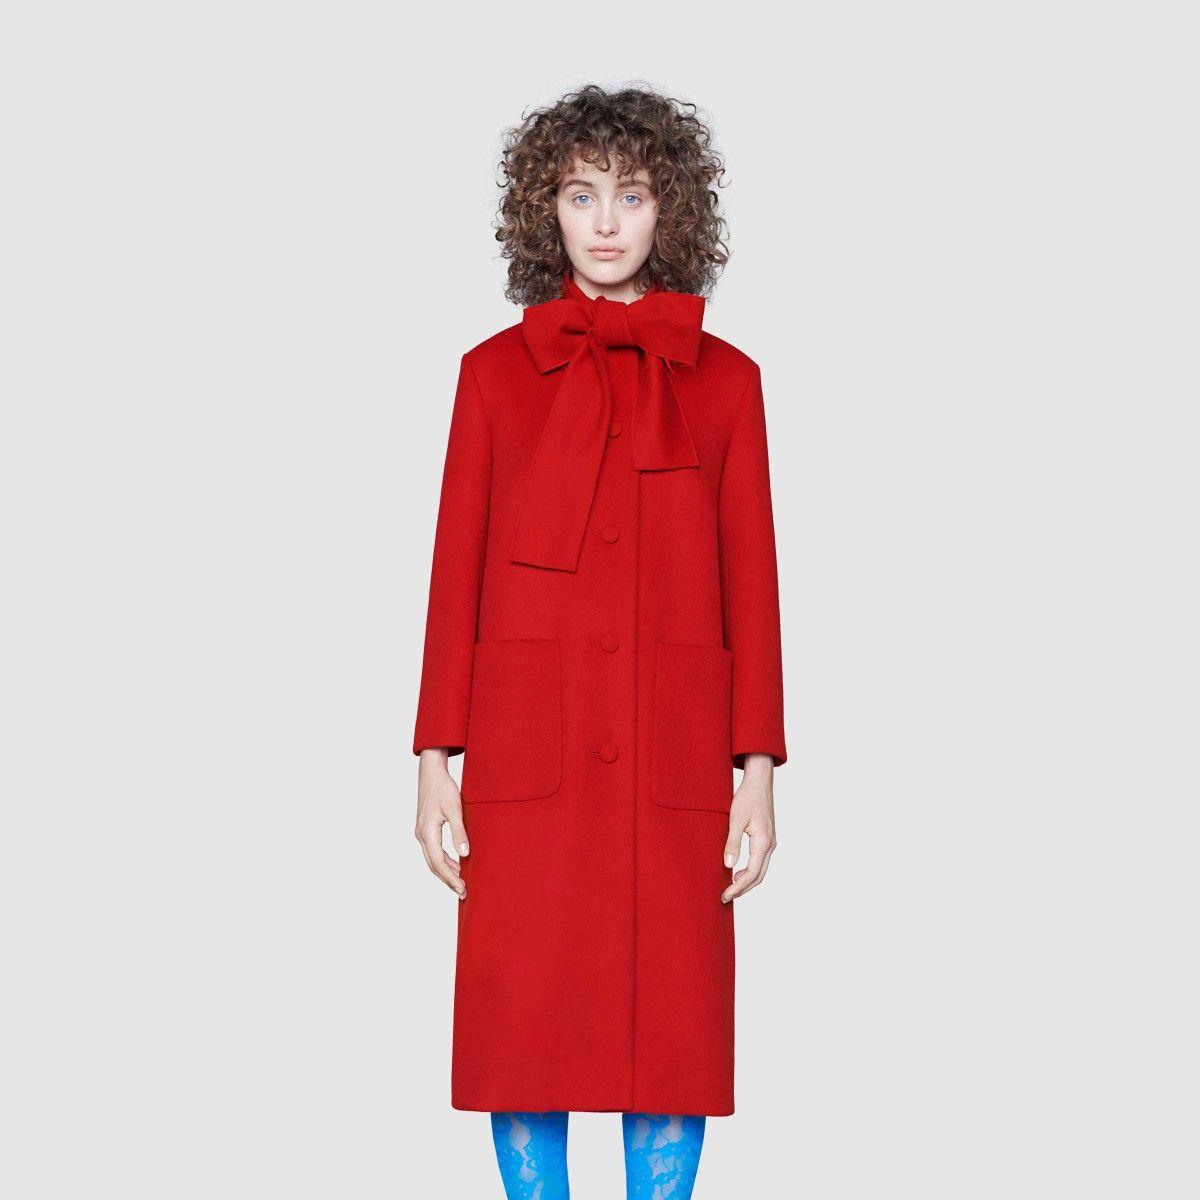 Gucci Wool Coat Fashion Coat Coats For Women [ 1200 x 1200 Pixel ]